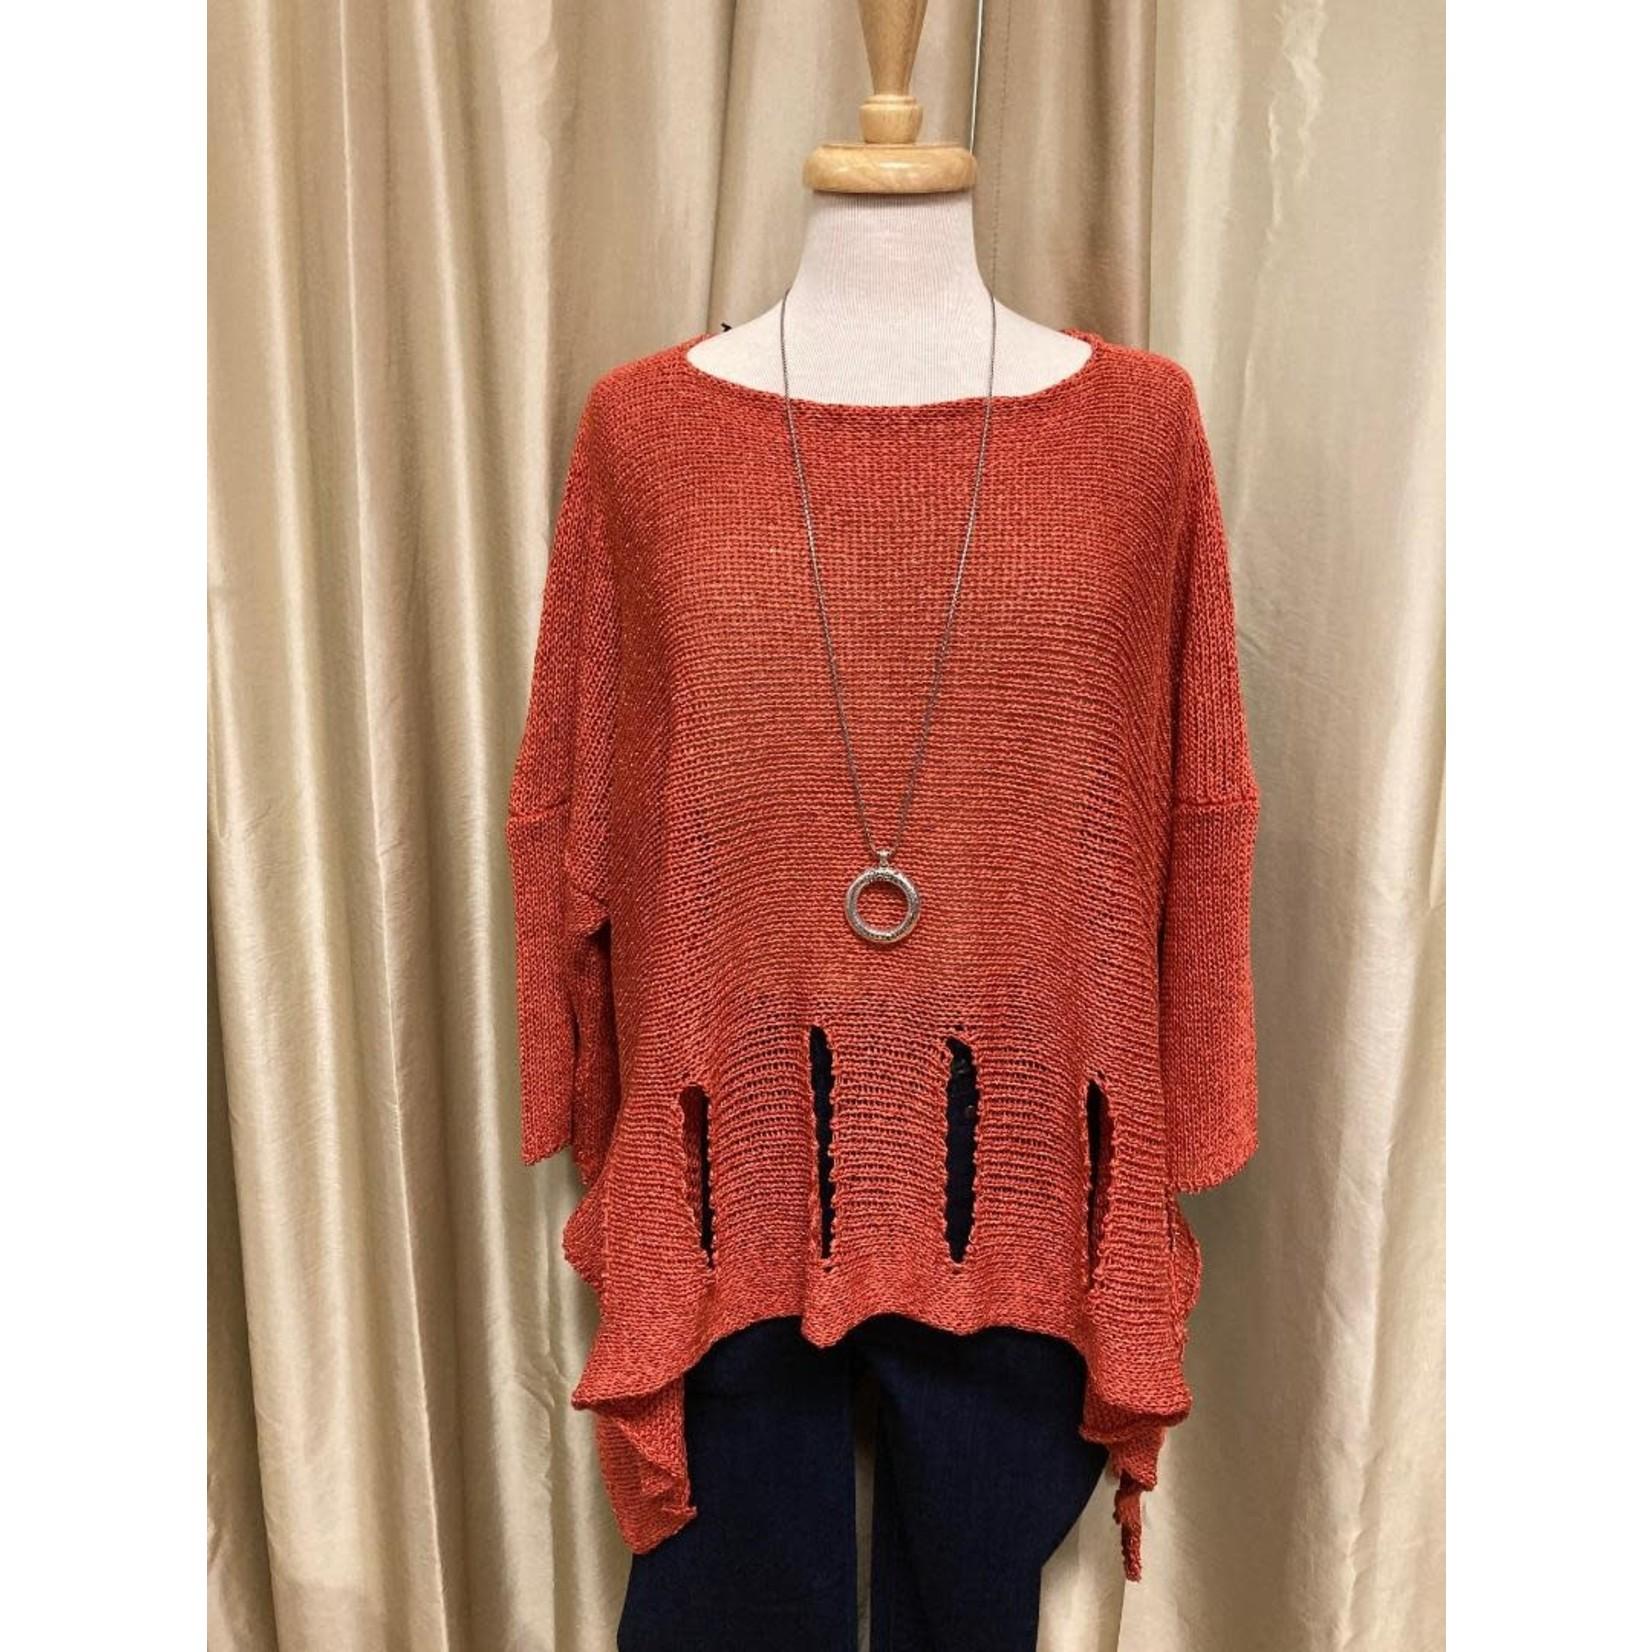 Holey Moley Sweater Fine Gauge  O/S Salmon